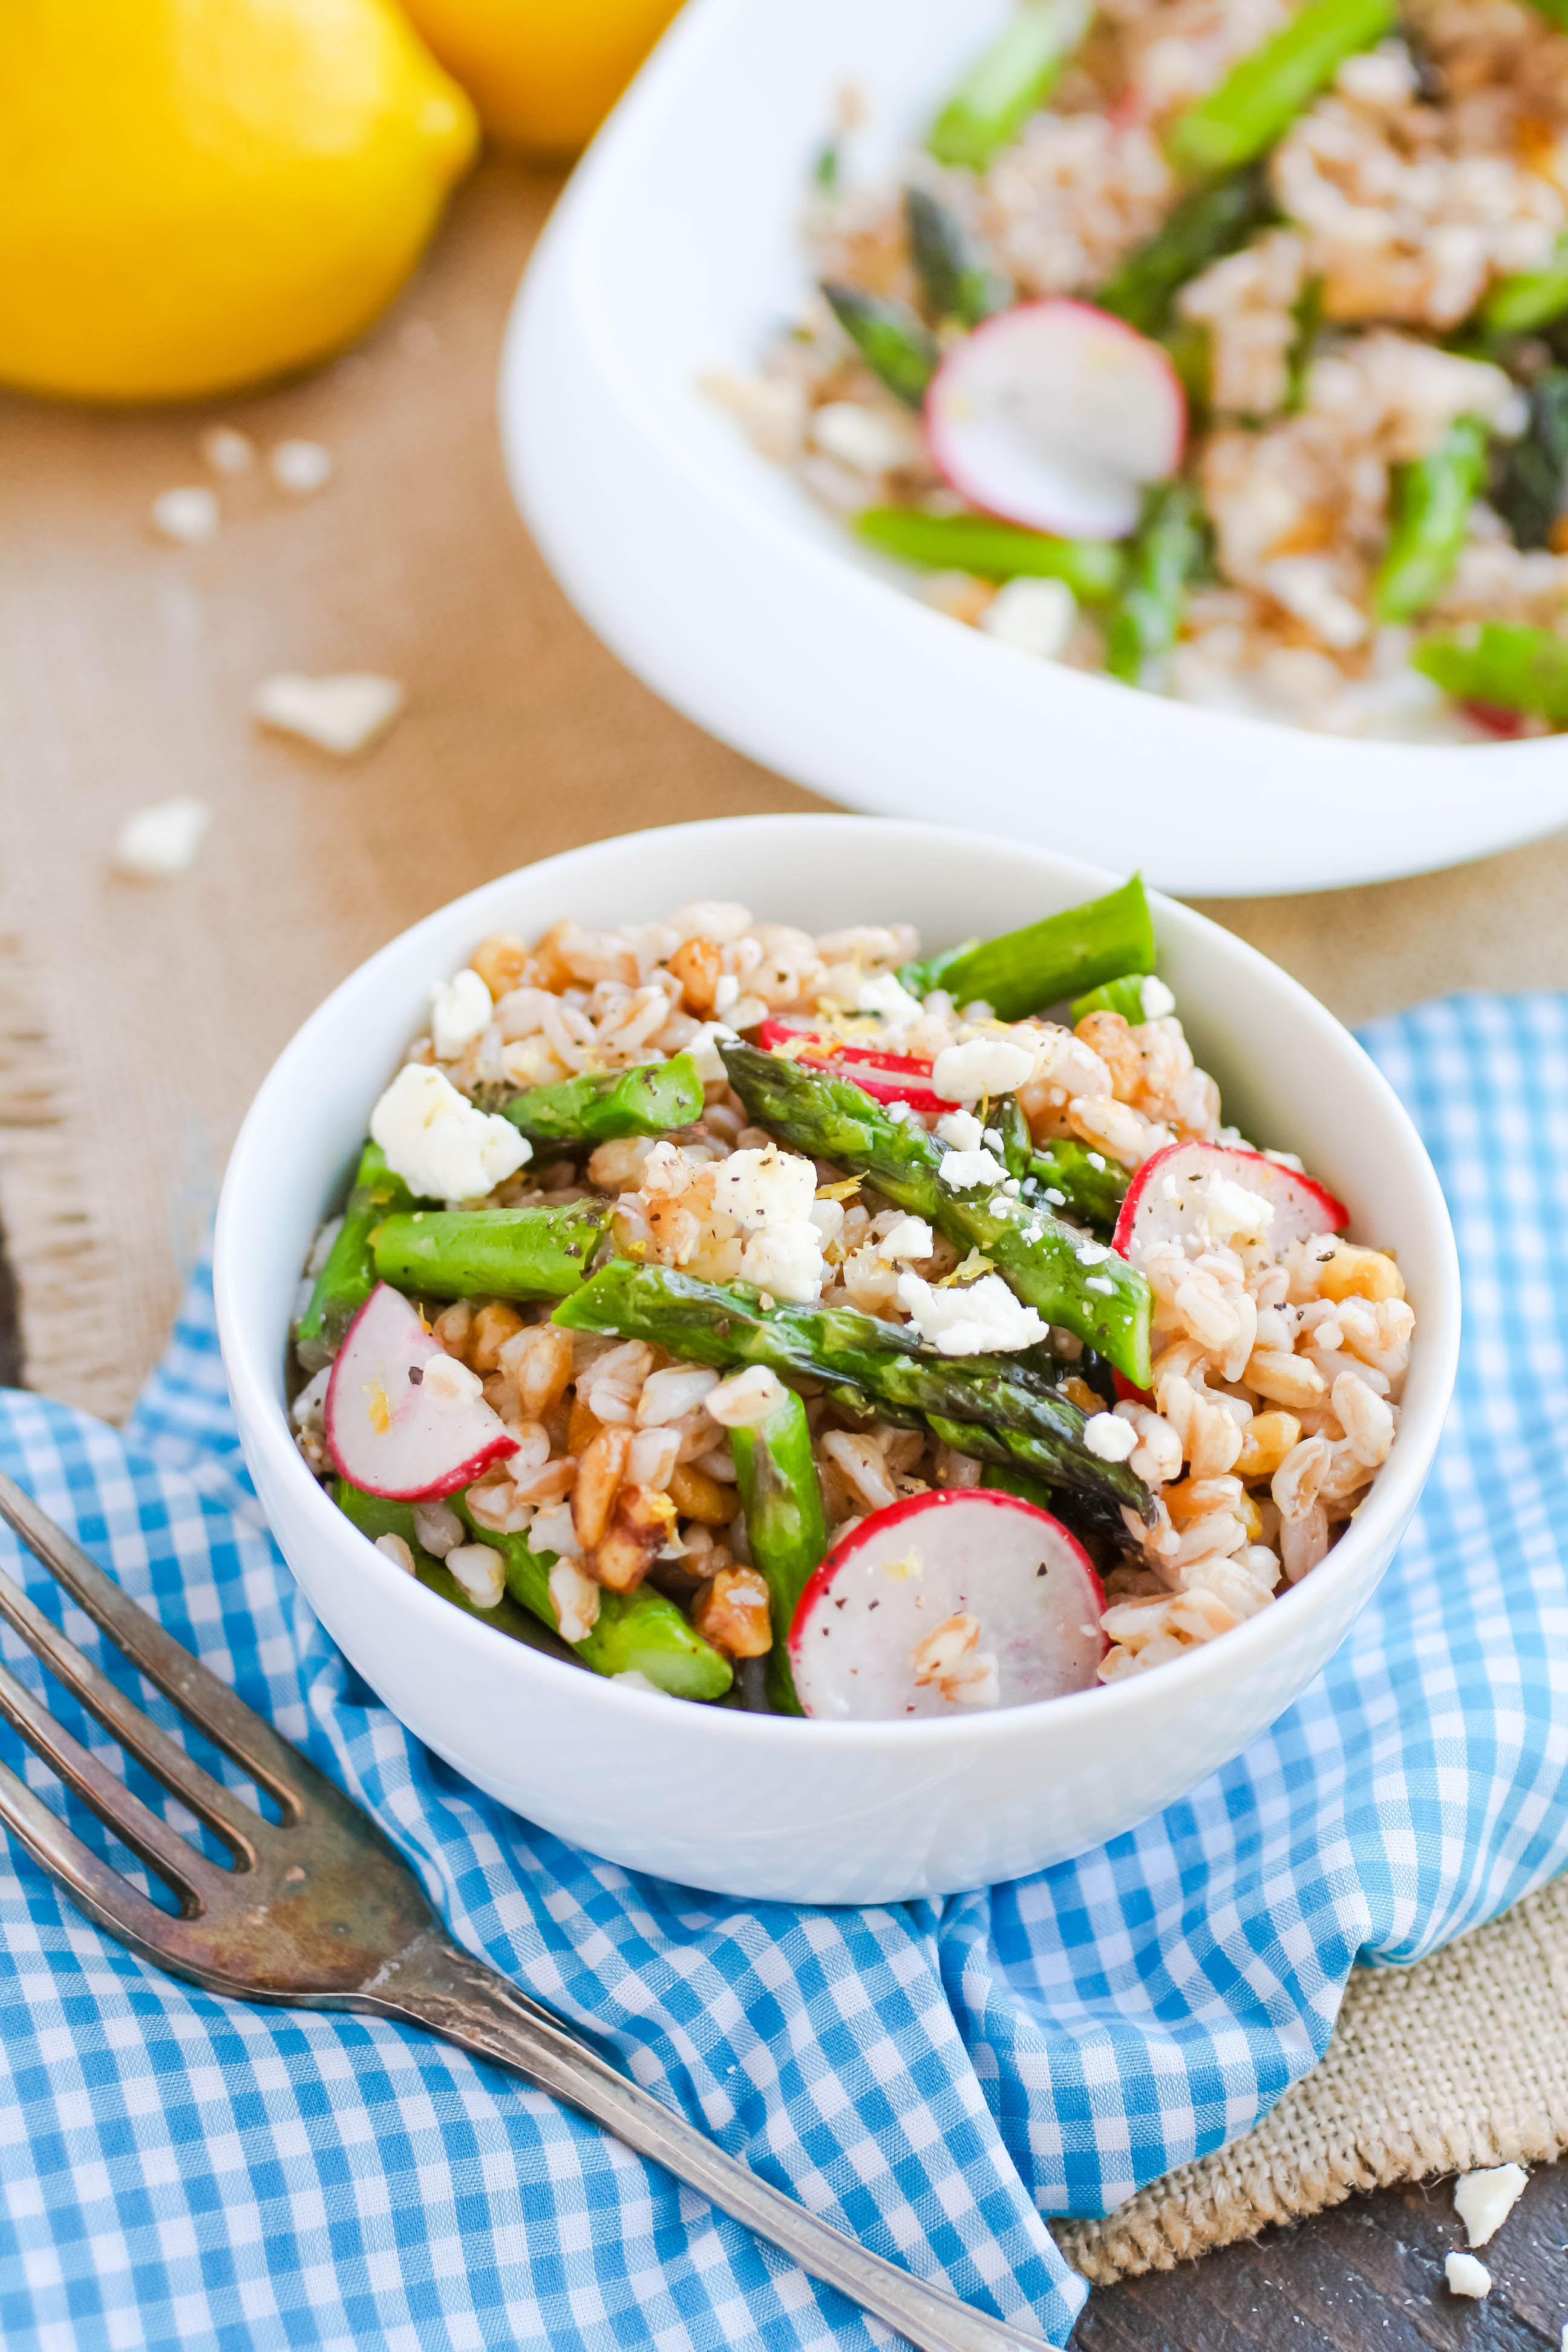 Farro Salad with Asparagus, Radishes & Lemon Vinaigrette is what you'll crave this season! Farro Salad with Asparagus, Radishes & Lemon Vinaigrette is a great salad for the season.